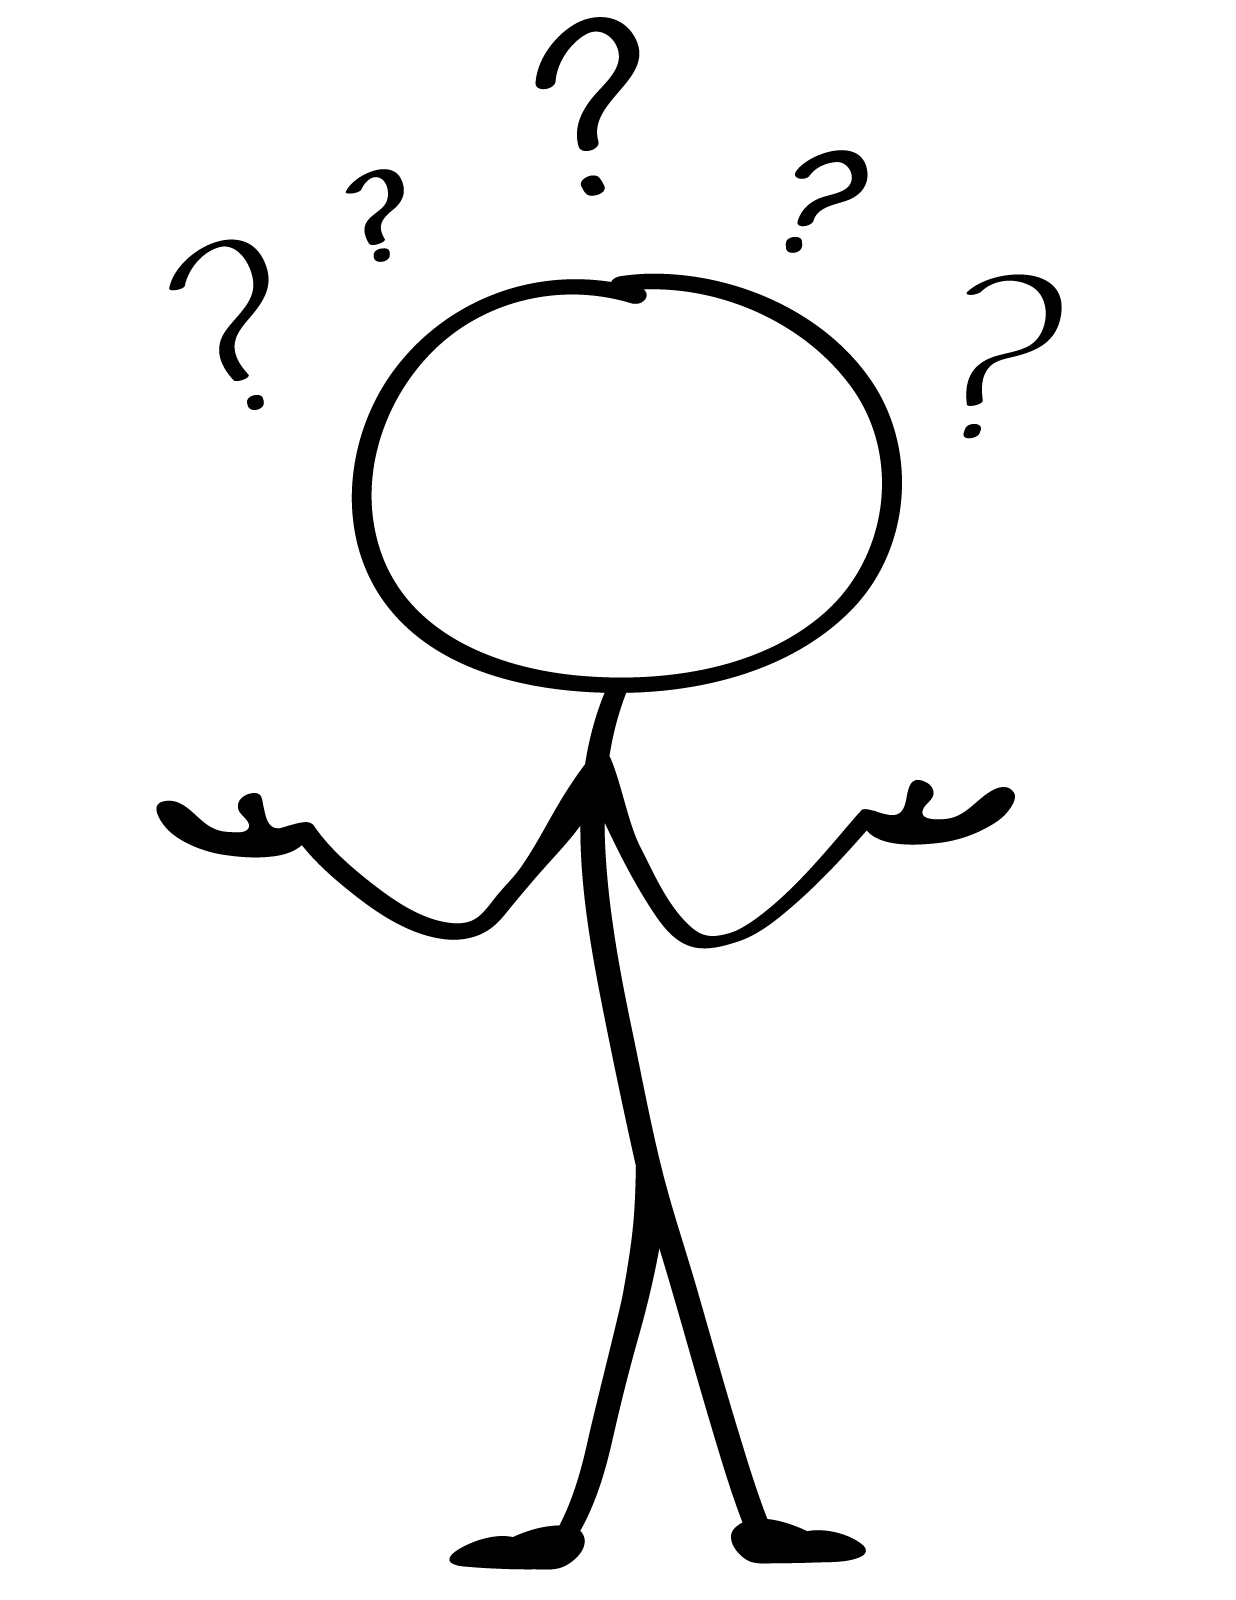 firmadoelalumnofilosofo